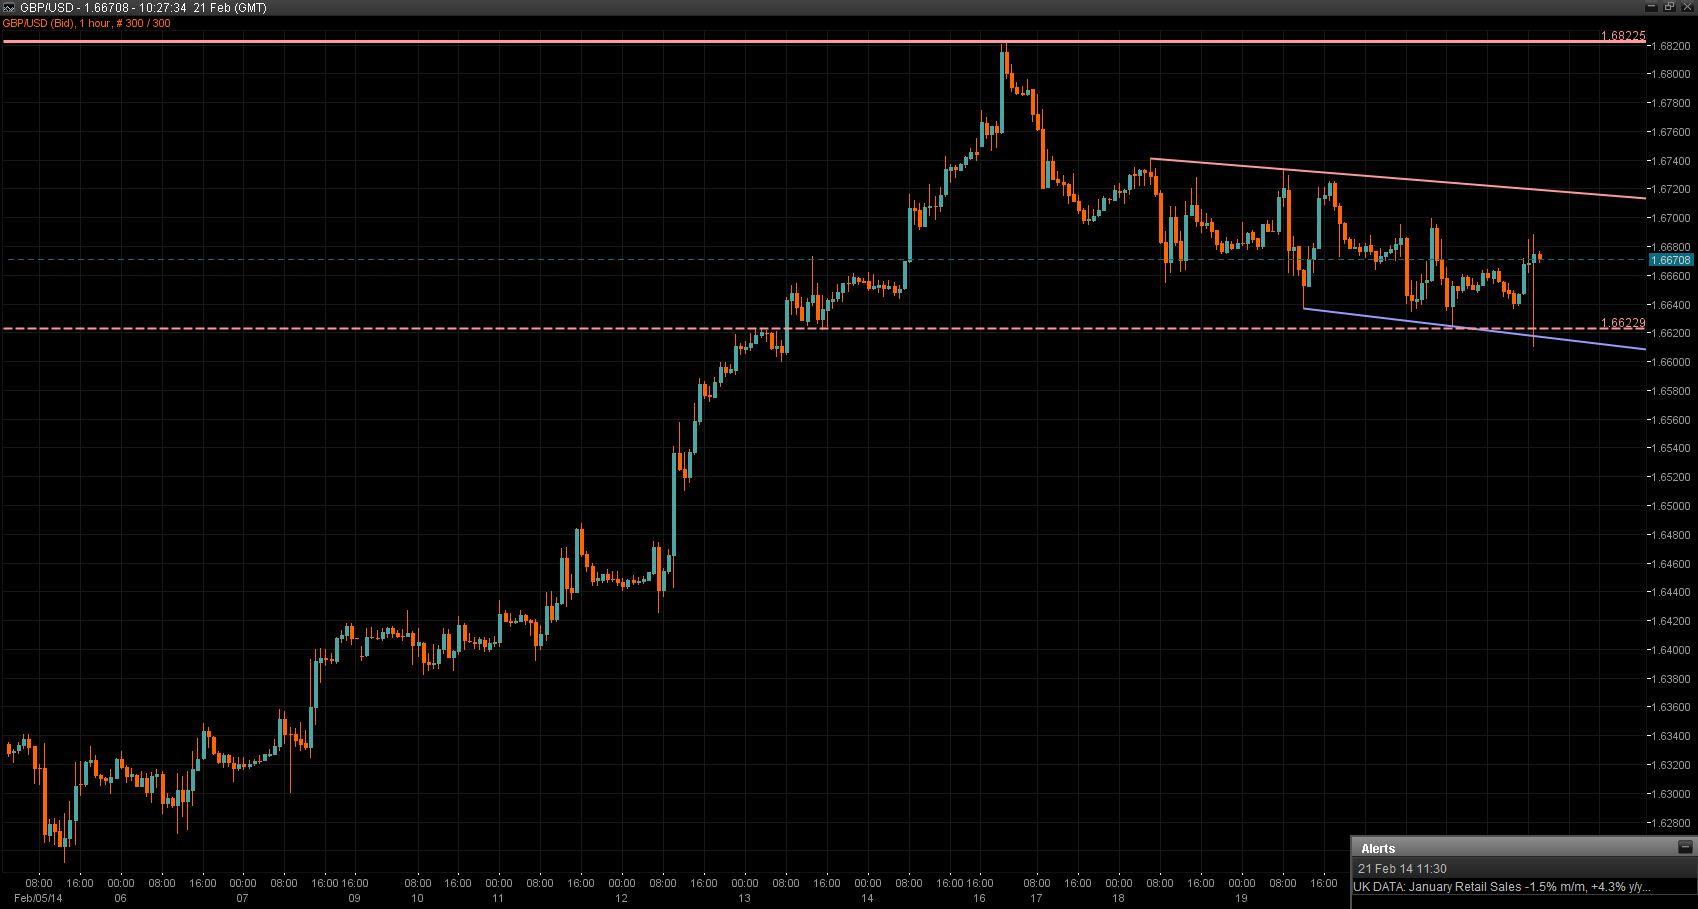 GBP/USD Chart 21 Feb 2014